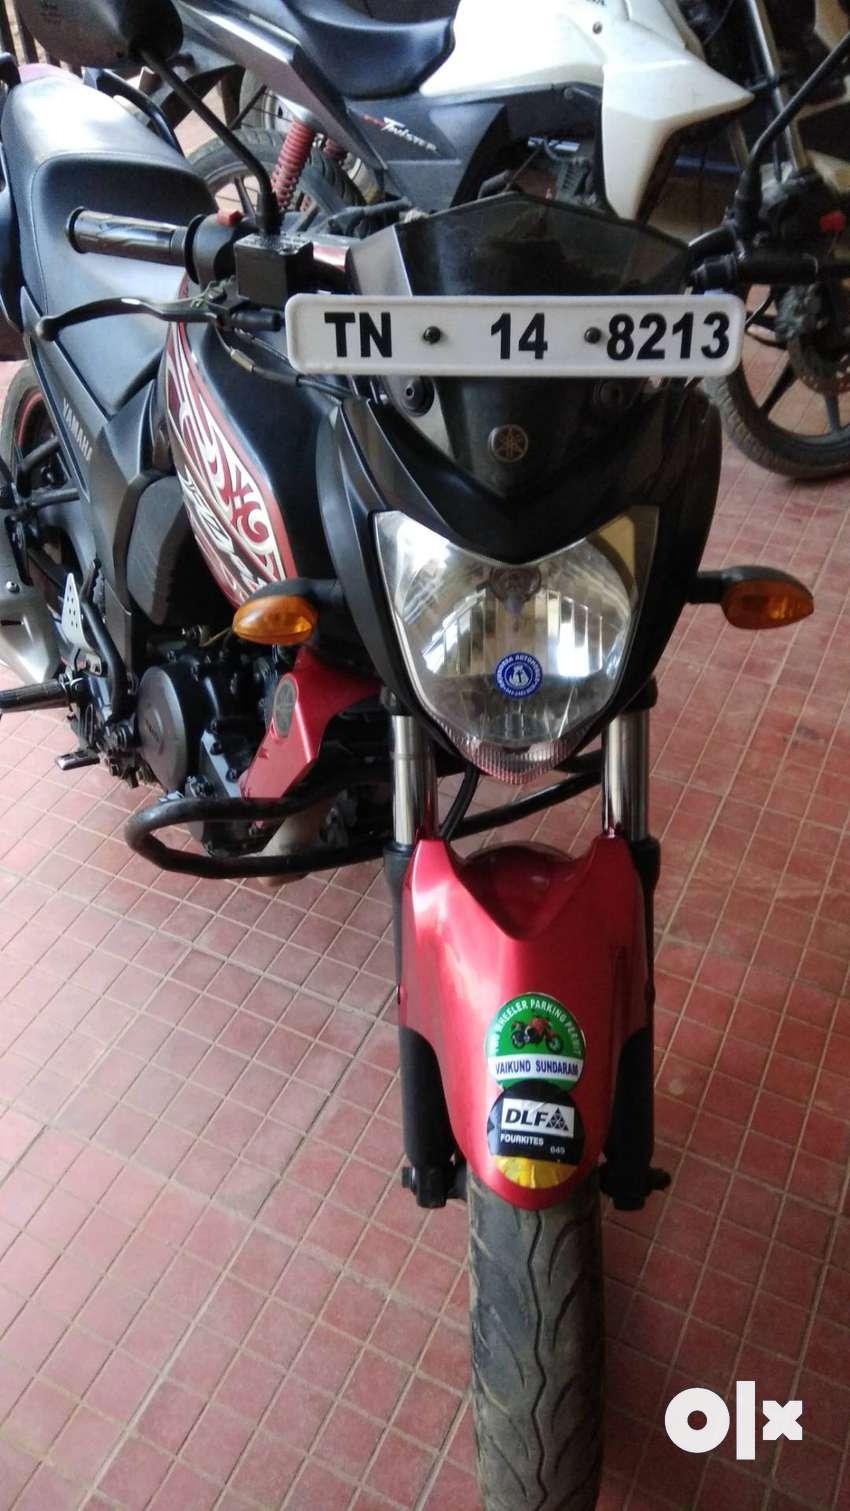 FZS bike with regular servicing 0